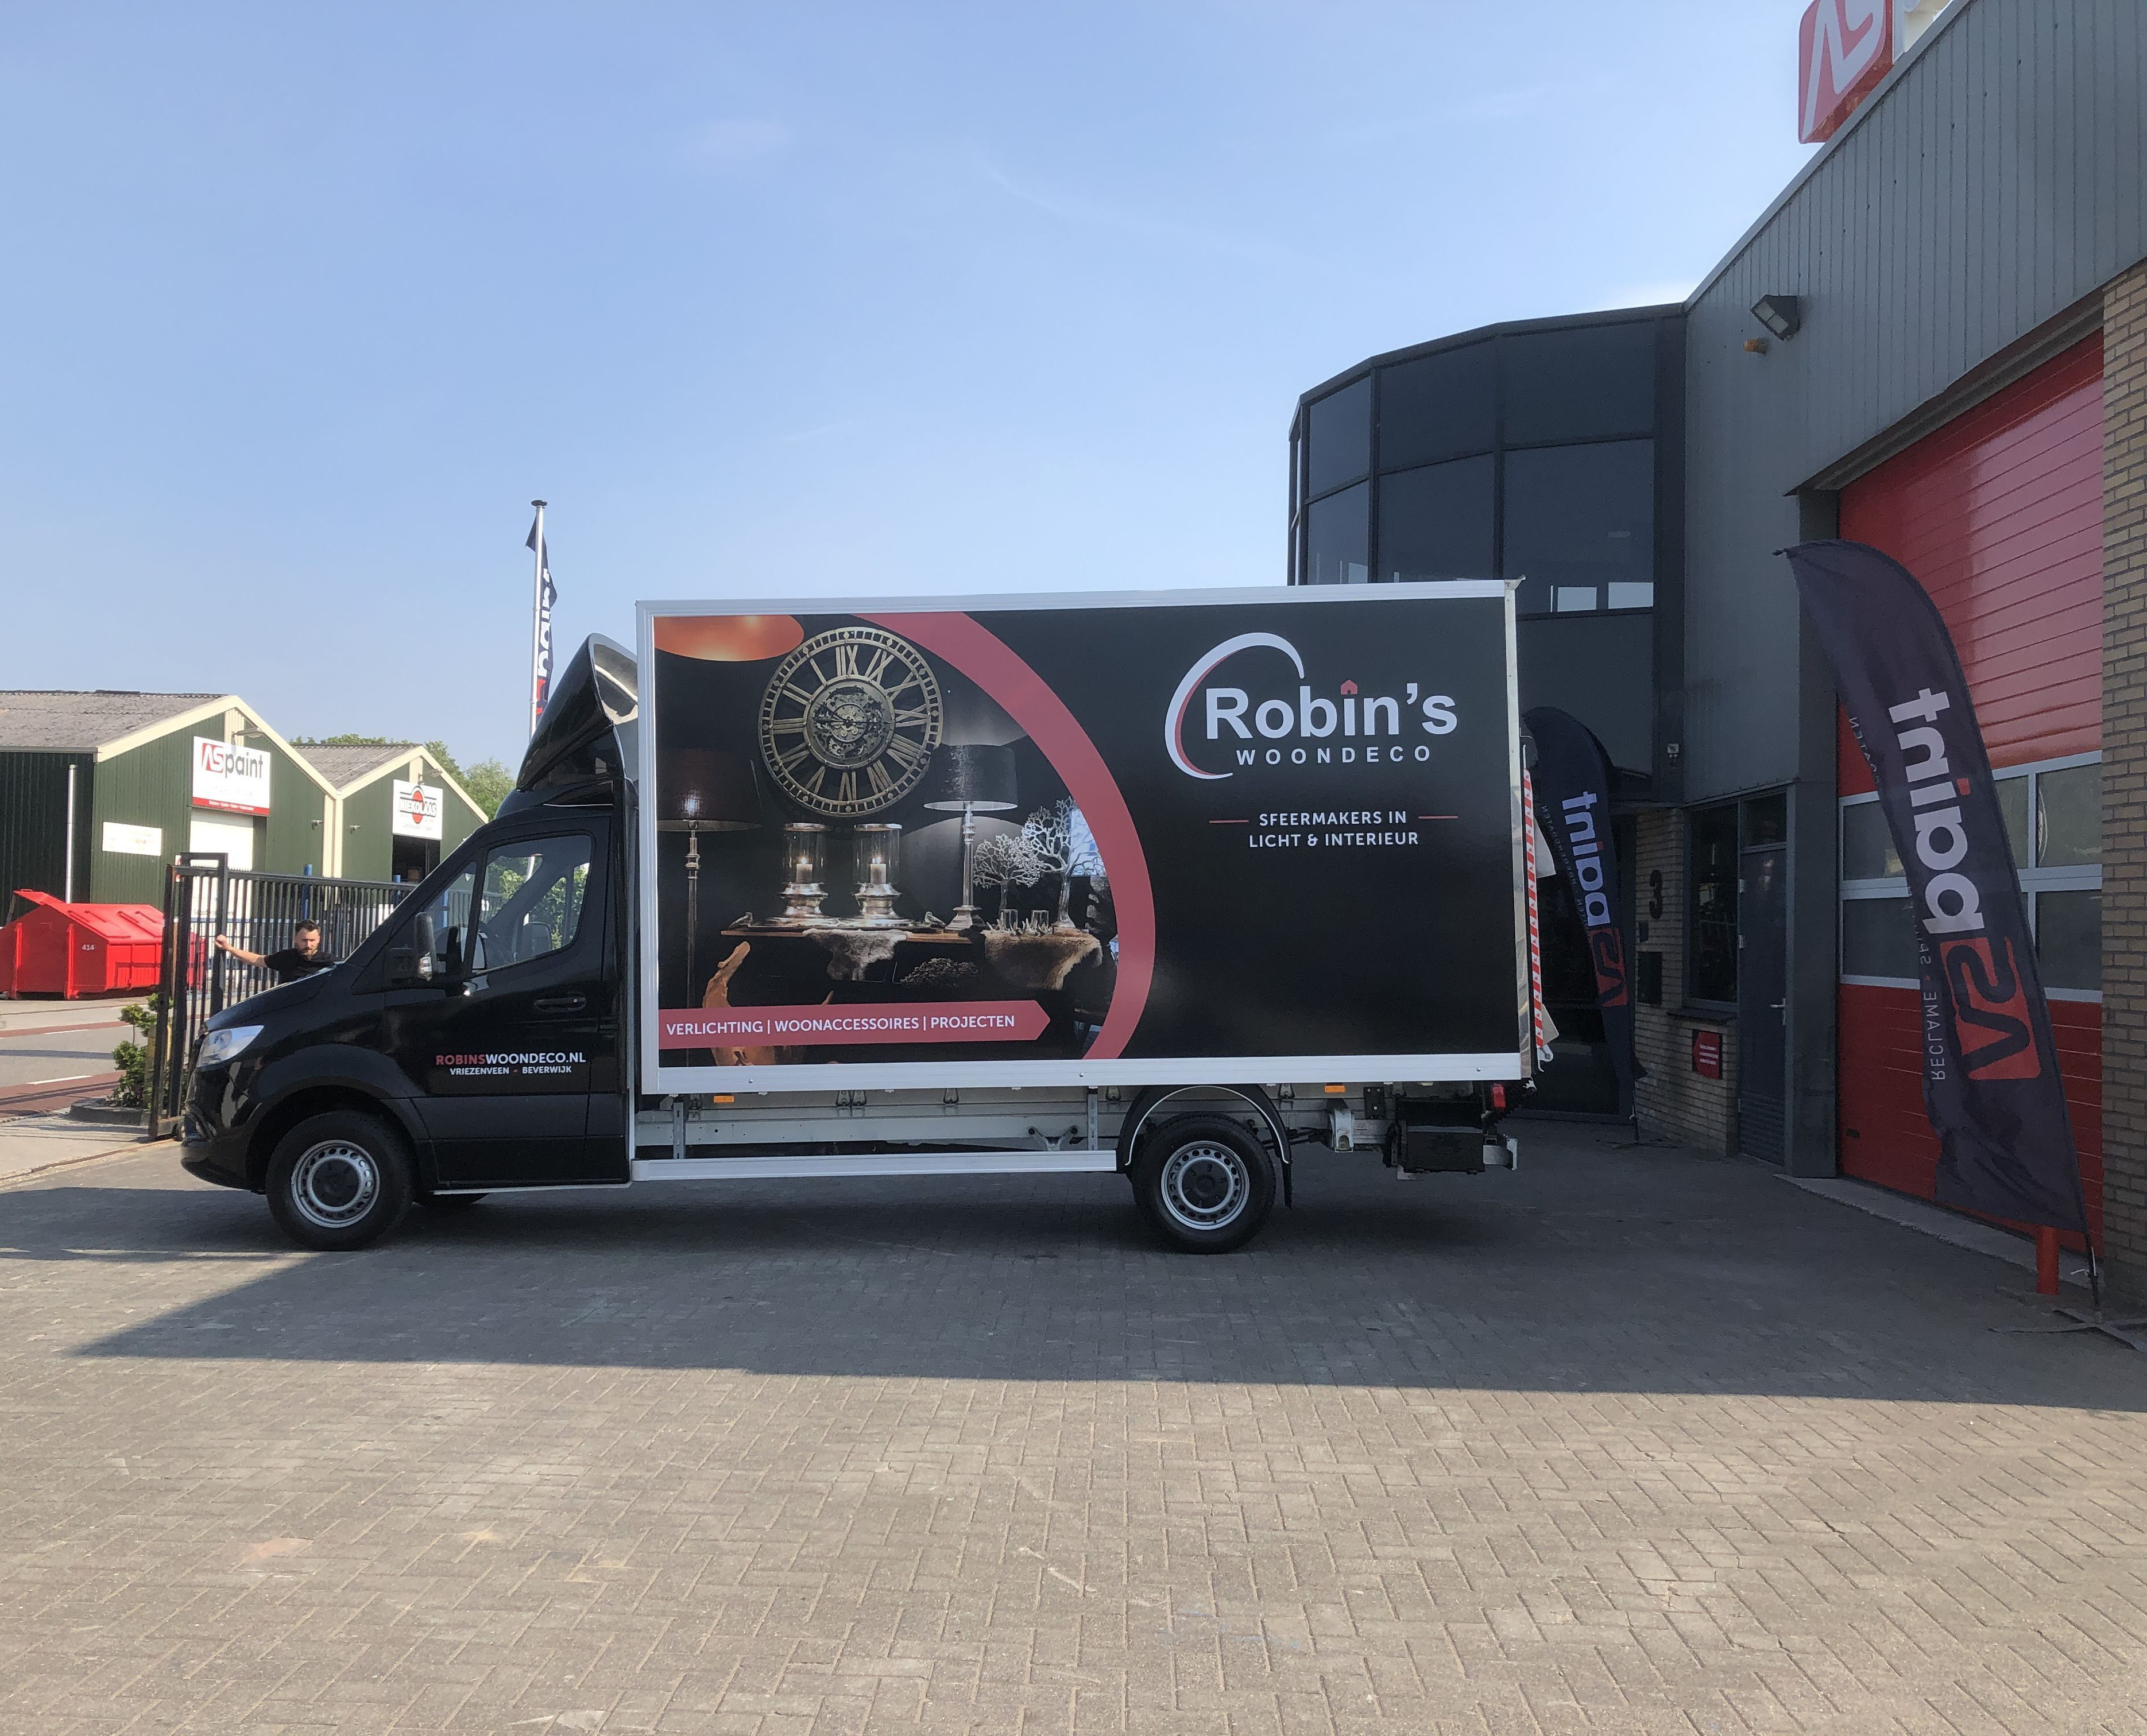 Carwrap, sign, full color print, reclame, autobelettering, voertuigbelettering, AS Paint, Robin's woondeco, Vriezenveen, Twente